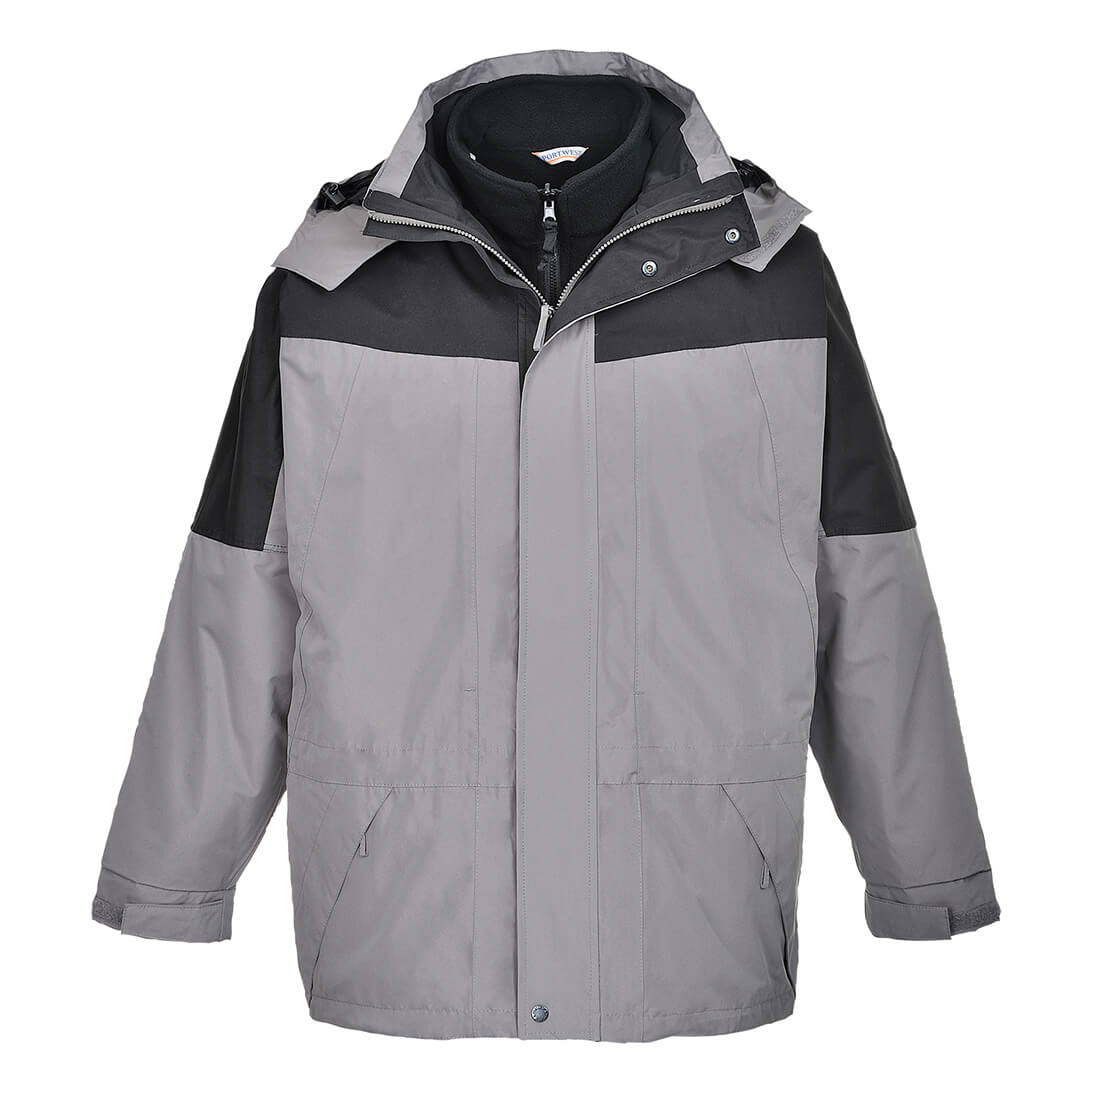 Image of Aviemore Mens 3-in-1 Waterproof Jacket Grey 2XL